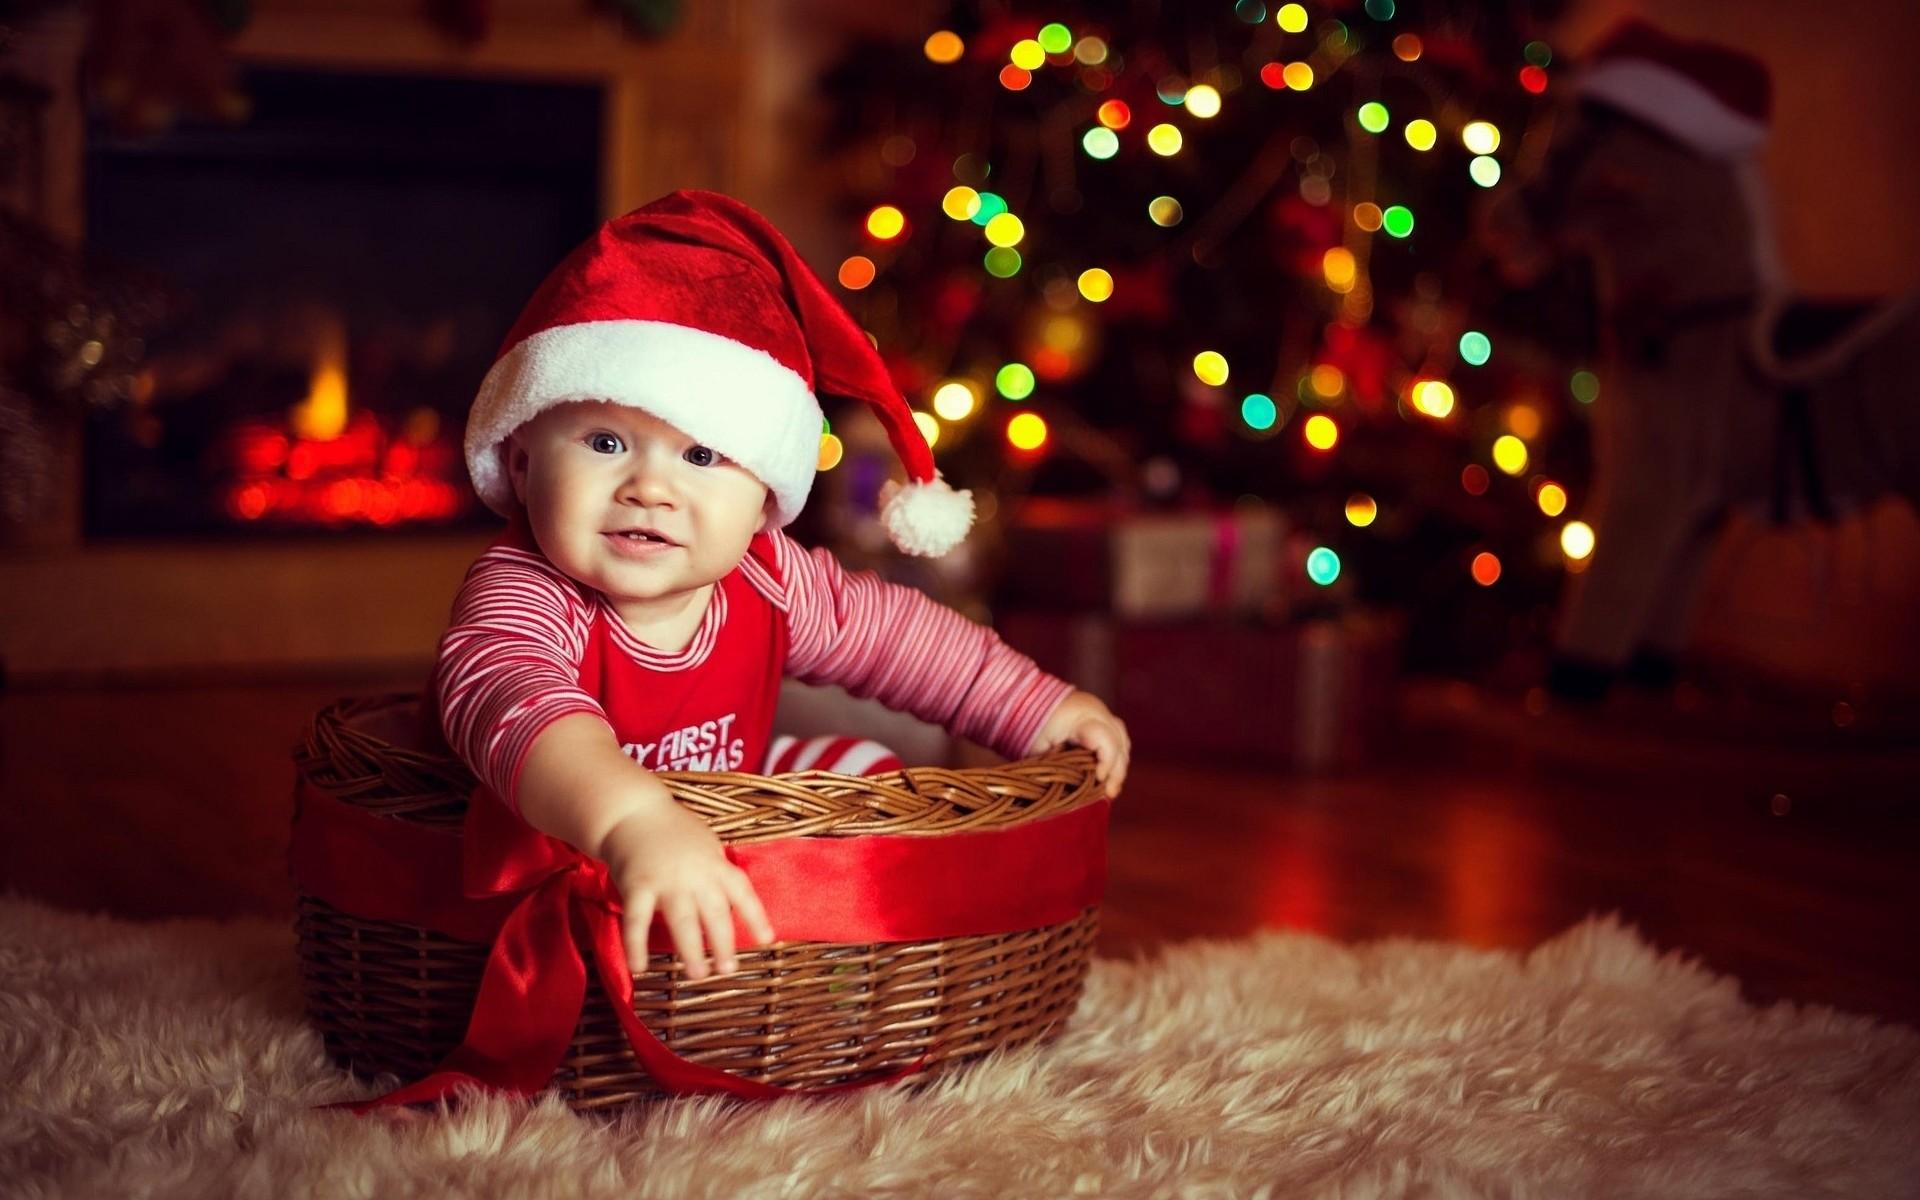 Cute Baby Wearing Christmas Cap Photo – View 1920 x 1200